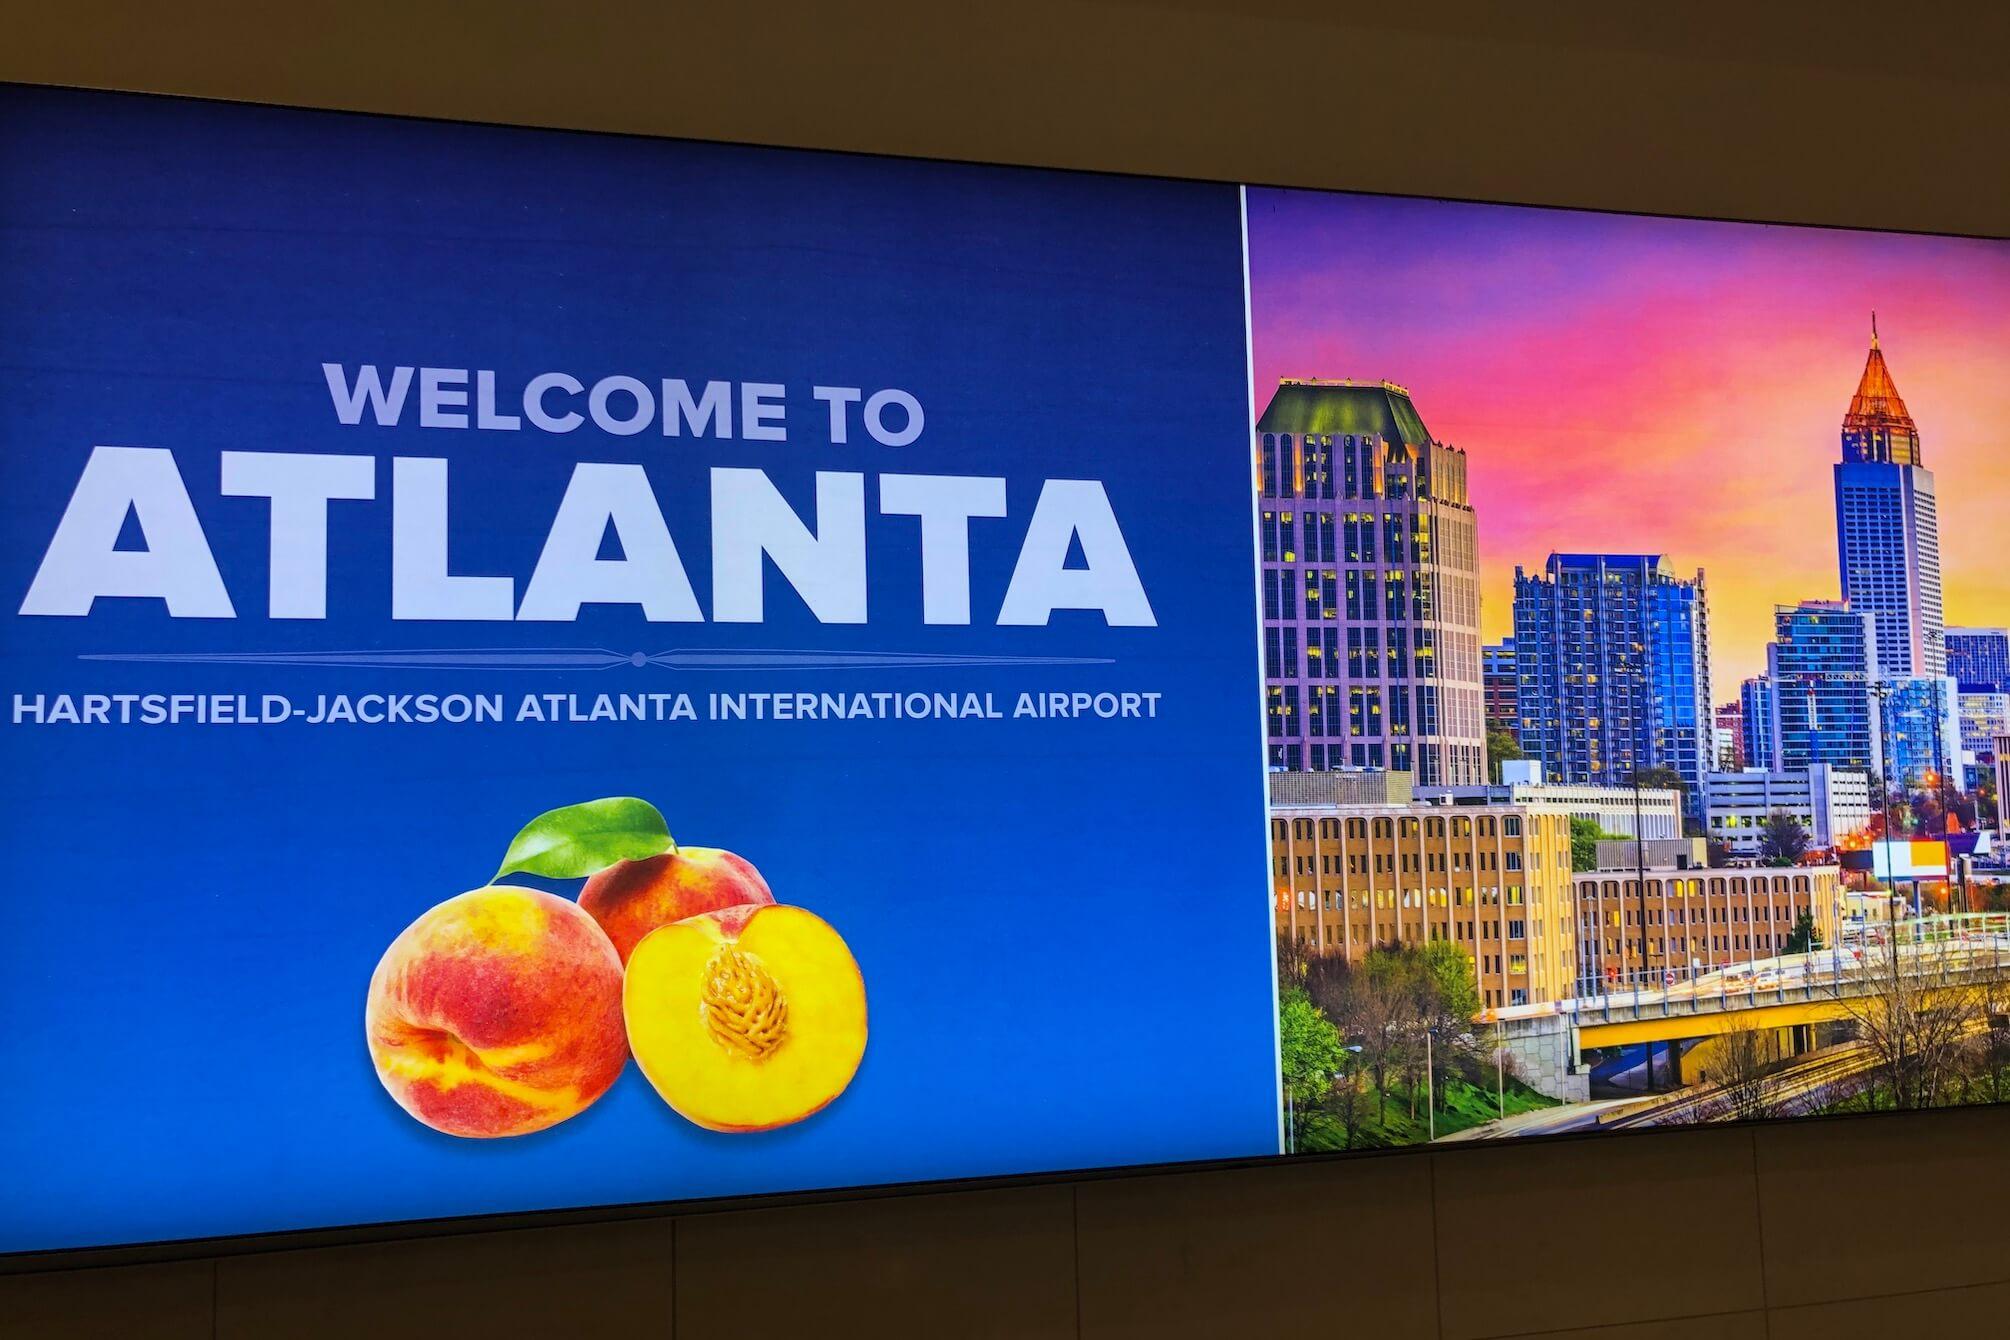 200 Tage Expatmamas in Atlanta - www.expatmamas.de/blog/ #expatmamas #imauslandzuhause #expatinatlanta